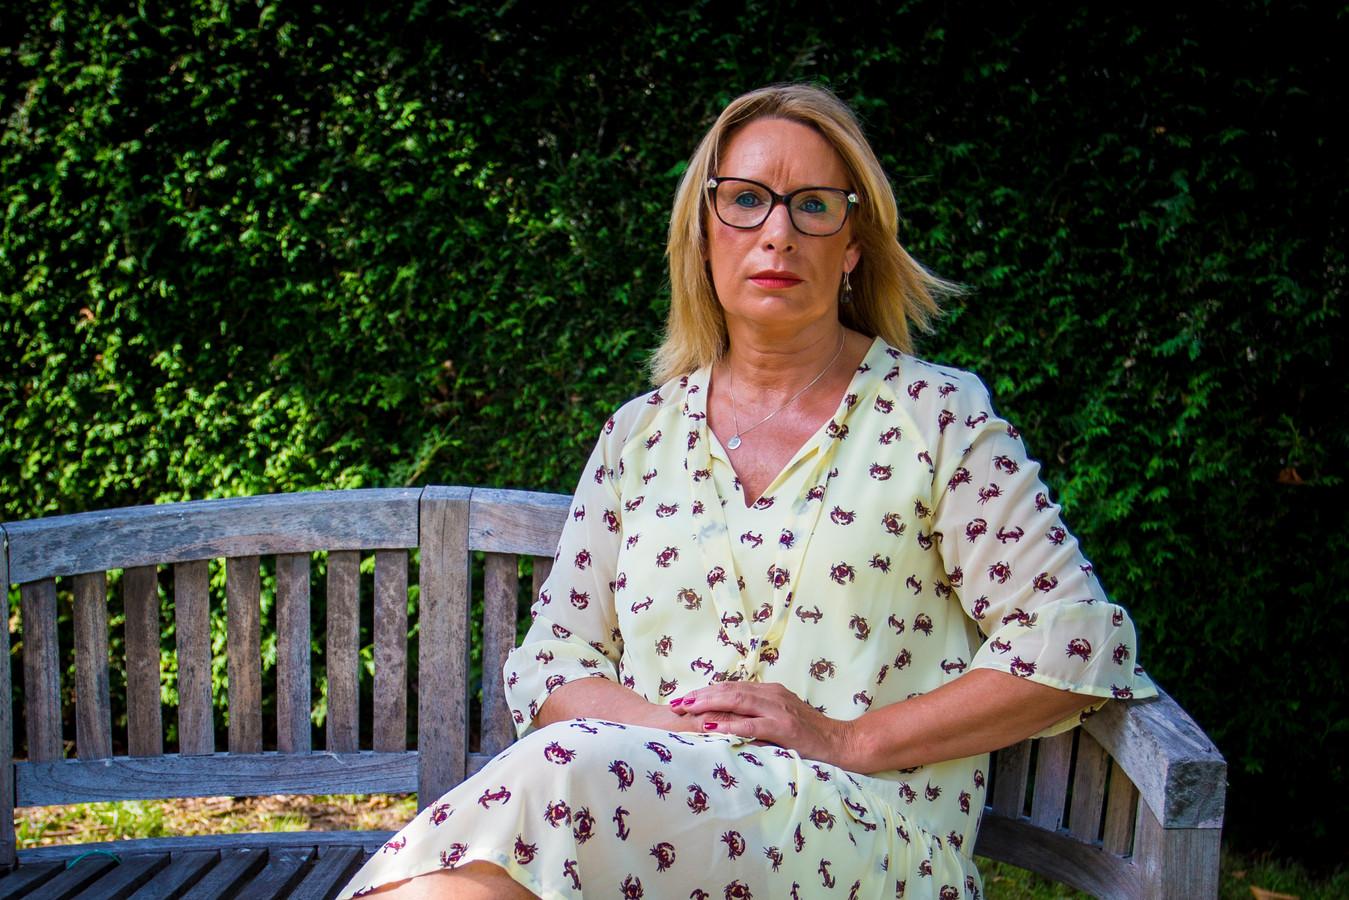 Carine Dhont (54), zorgmanager uit Zele